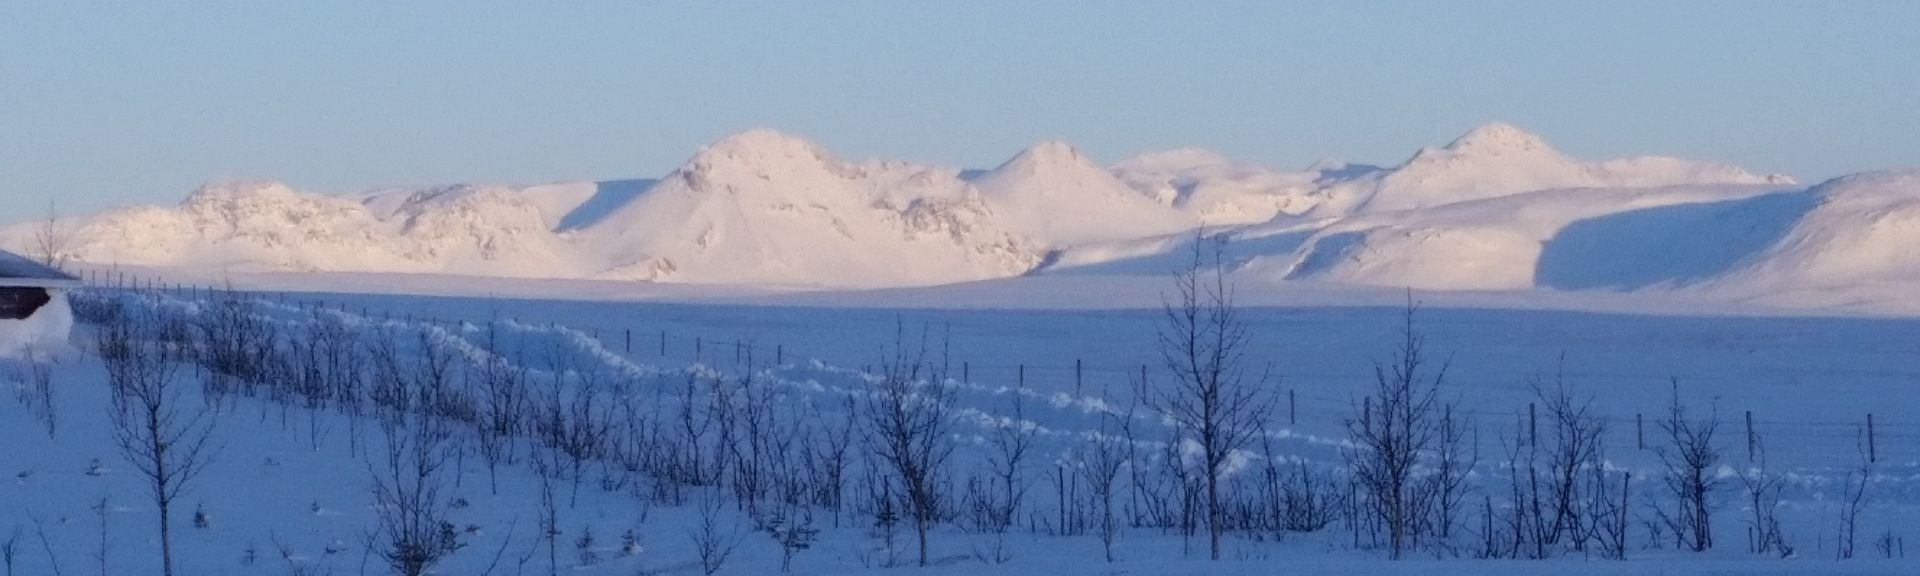 Strokkur, Bláskógabyggd, Southern Region, Iceland